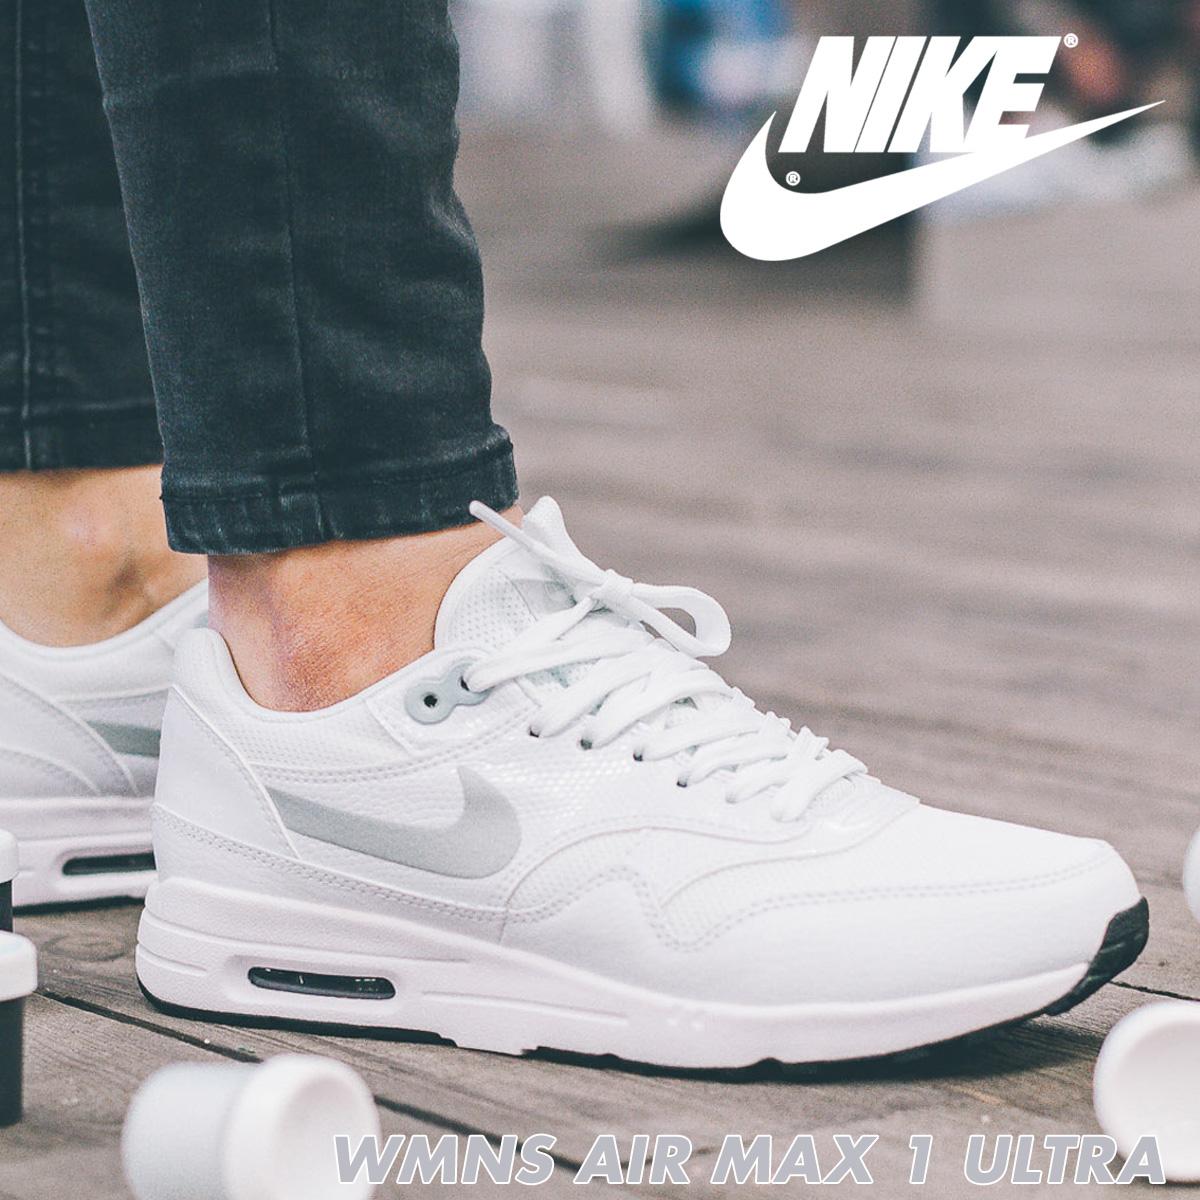 6e216d91 ... Nike NIKE Air Max 1 ultra 2.0 Lady's sneakers WMNS AIR MAX 1 ULTRA  881,104- ...